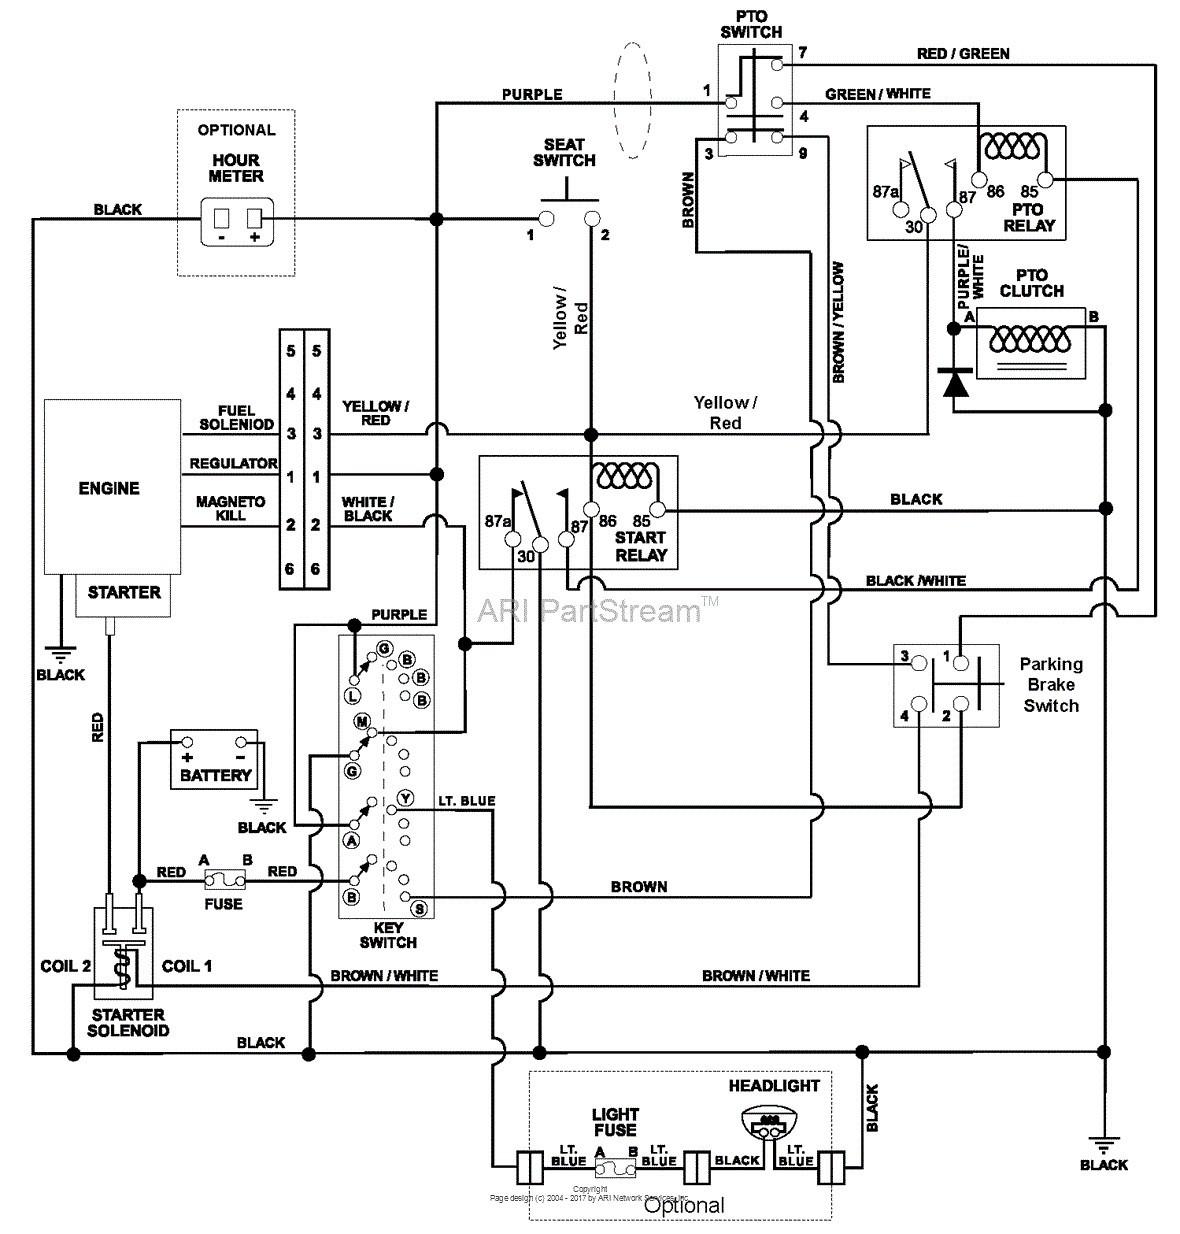 briggs and stratton wiring diagram - Wiring Diagram